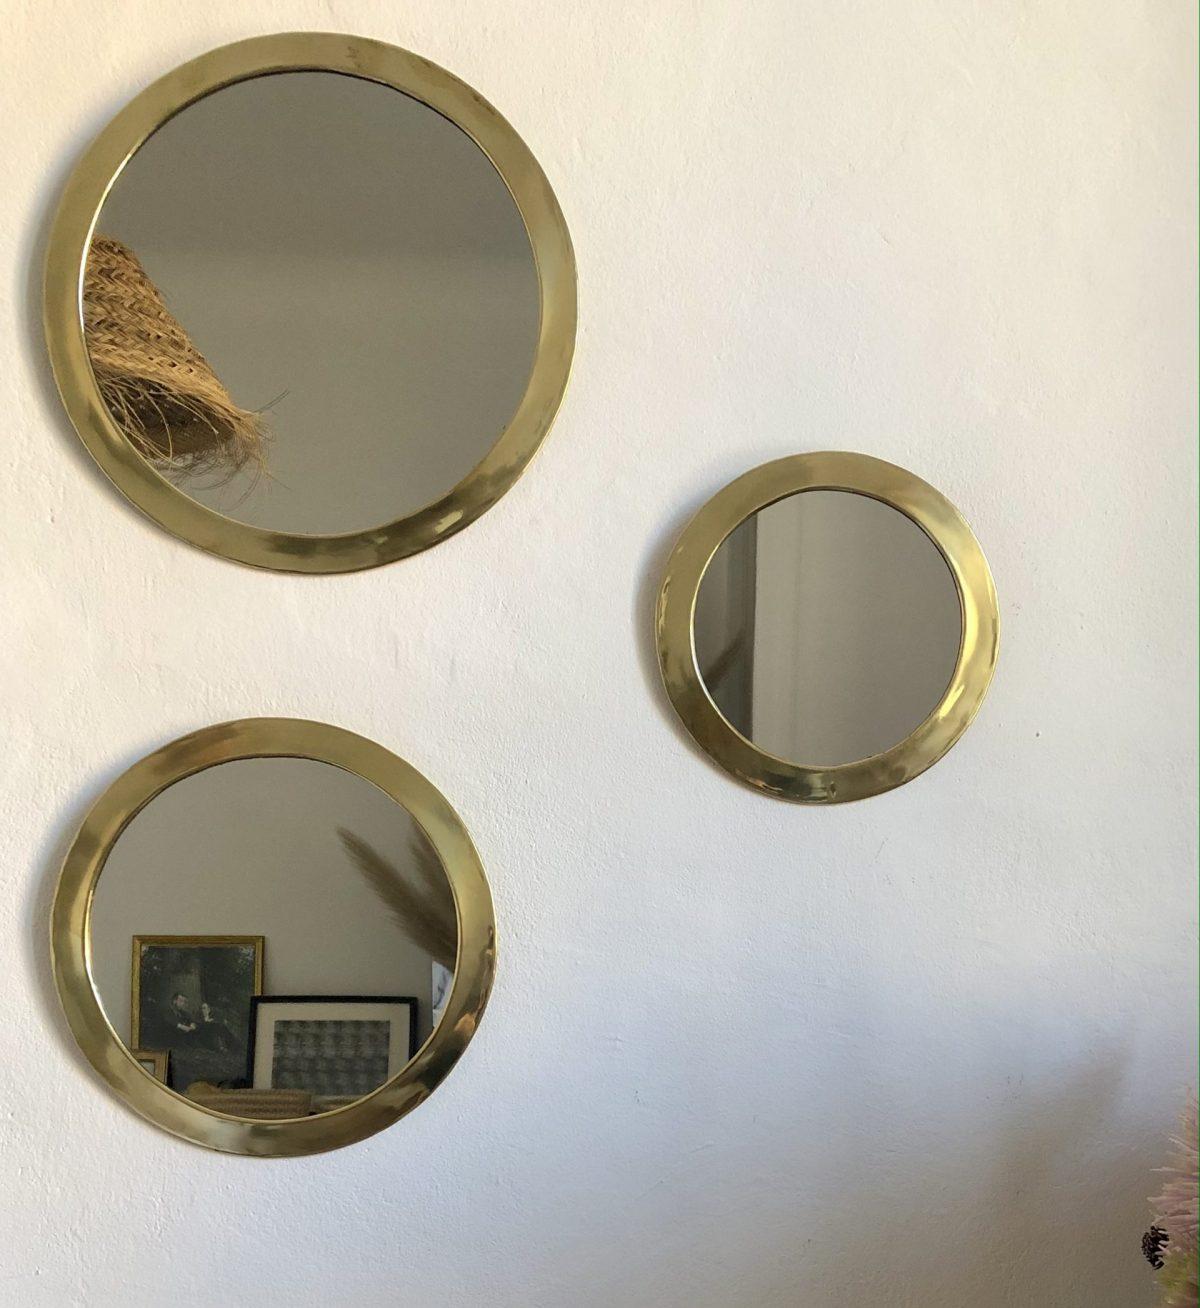 miroir_rond_epais